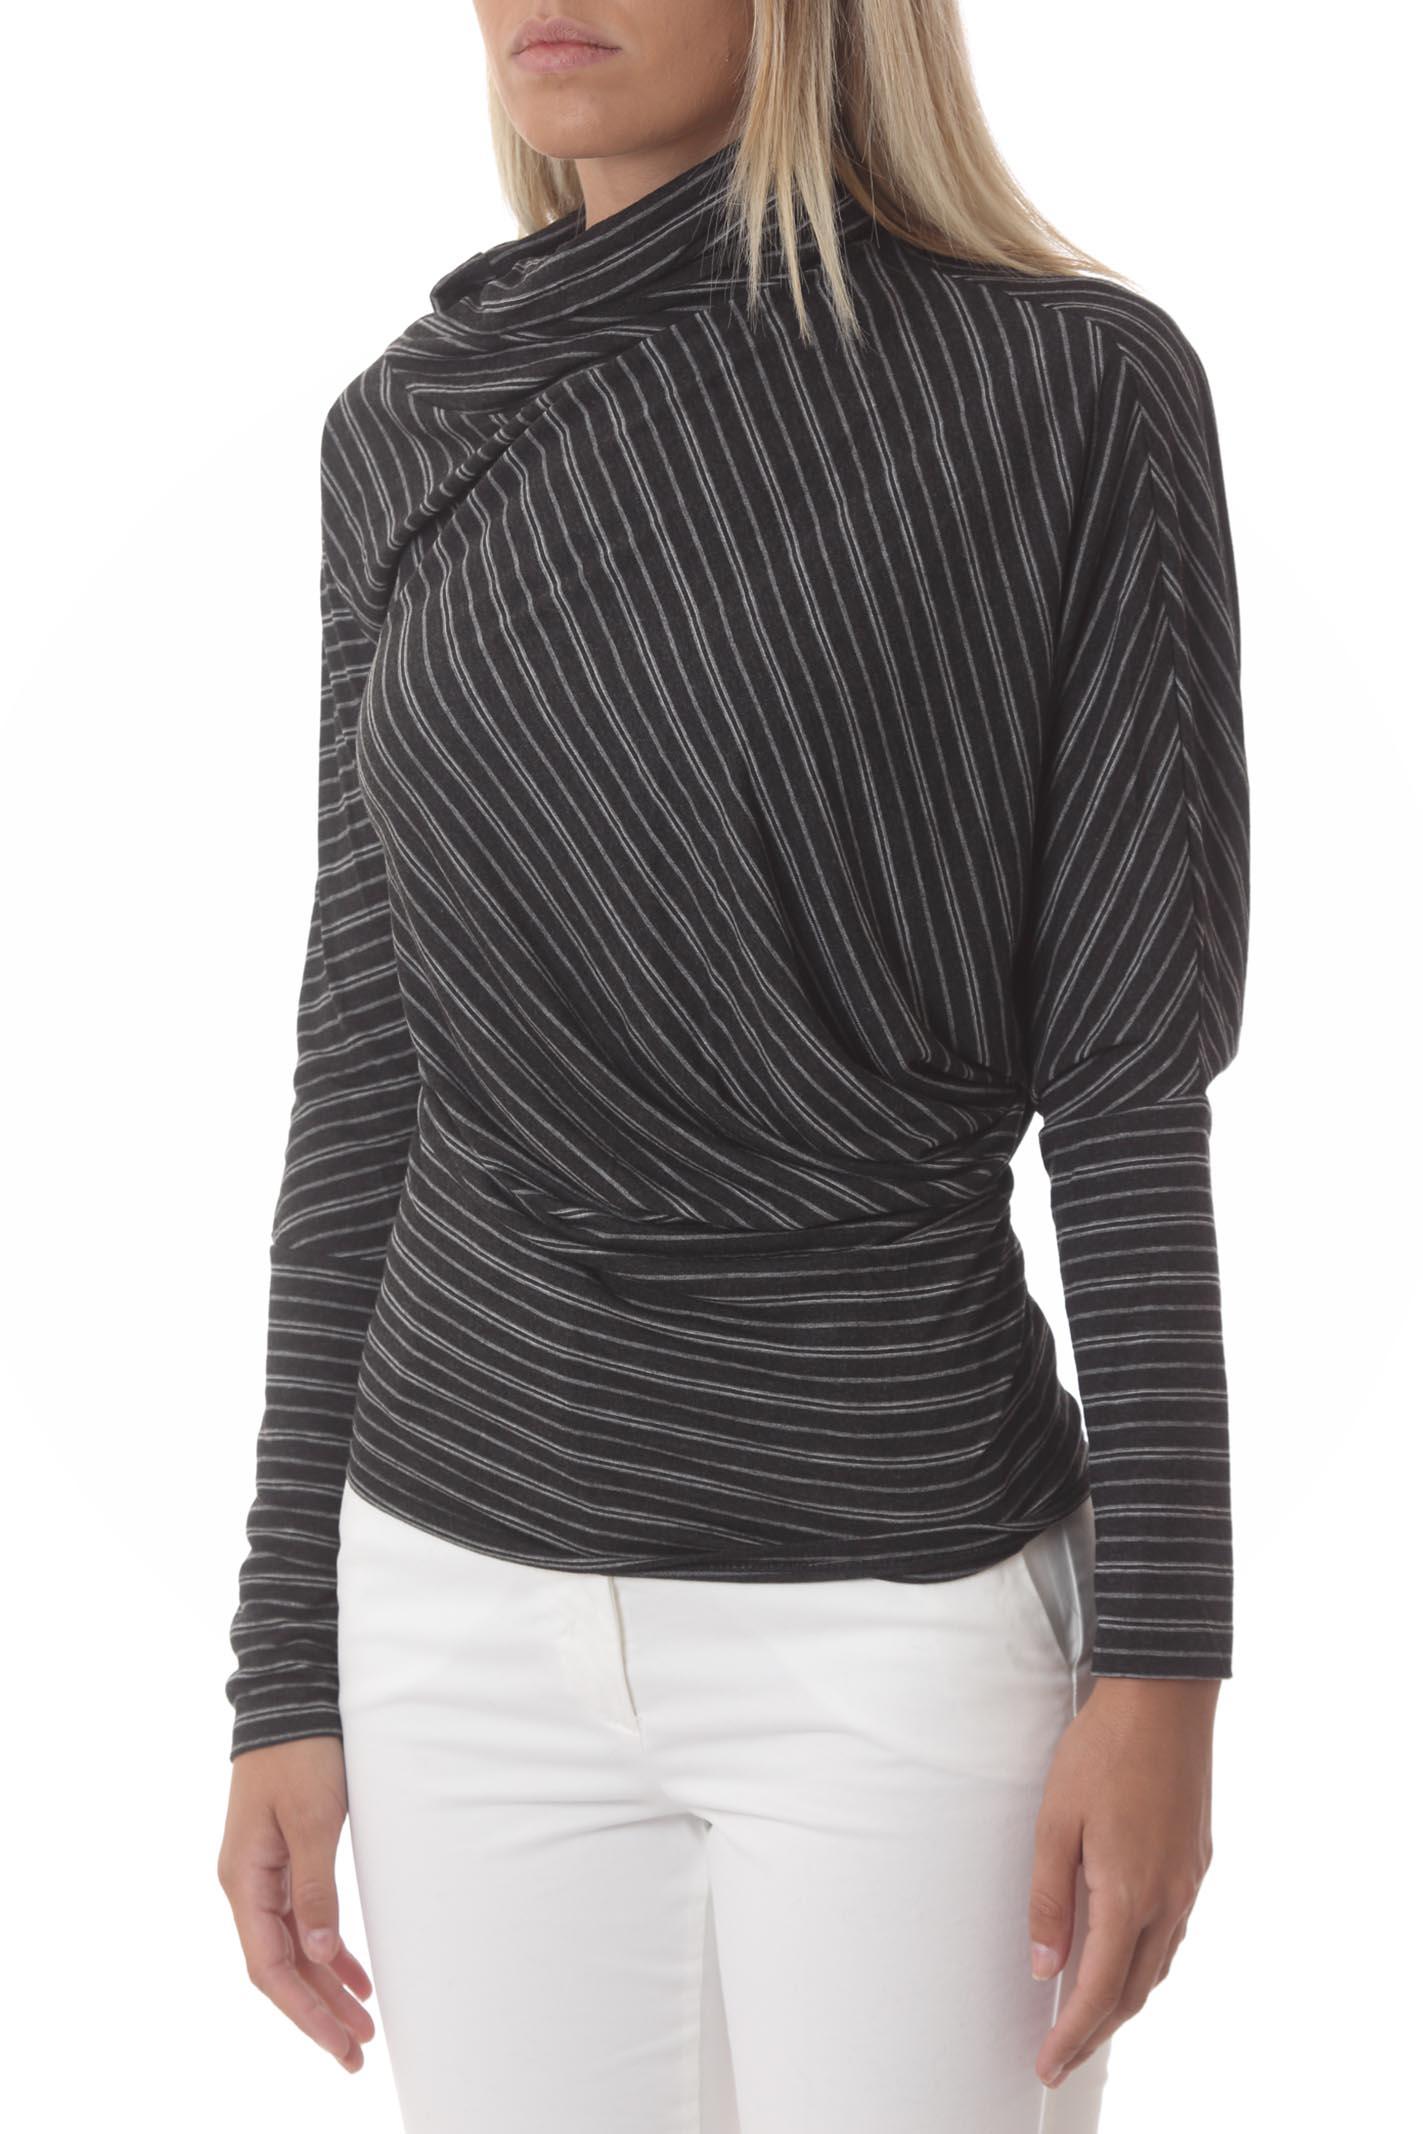 T-Shirt donna maniche lunghe MANILA GRACE | T- Shirt | T341CIMA135